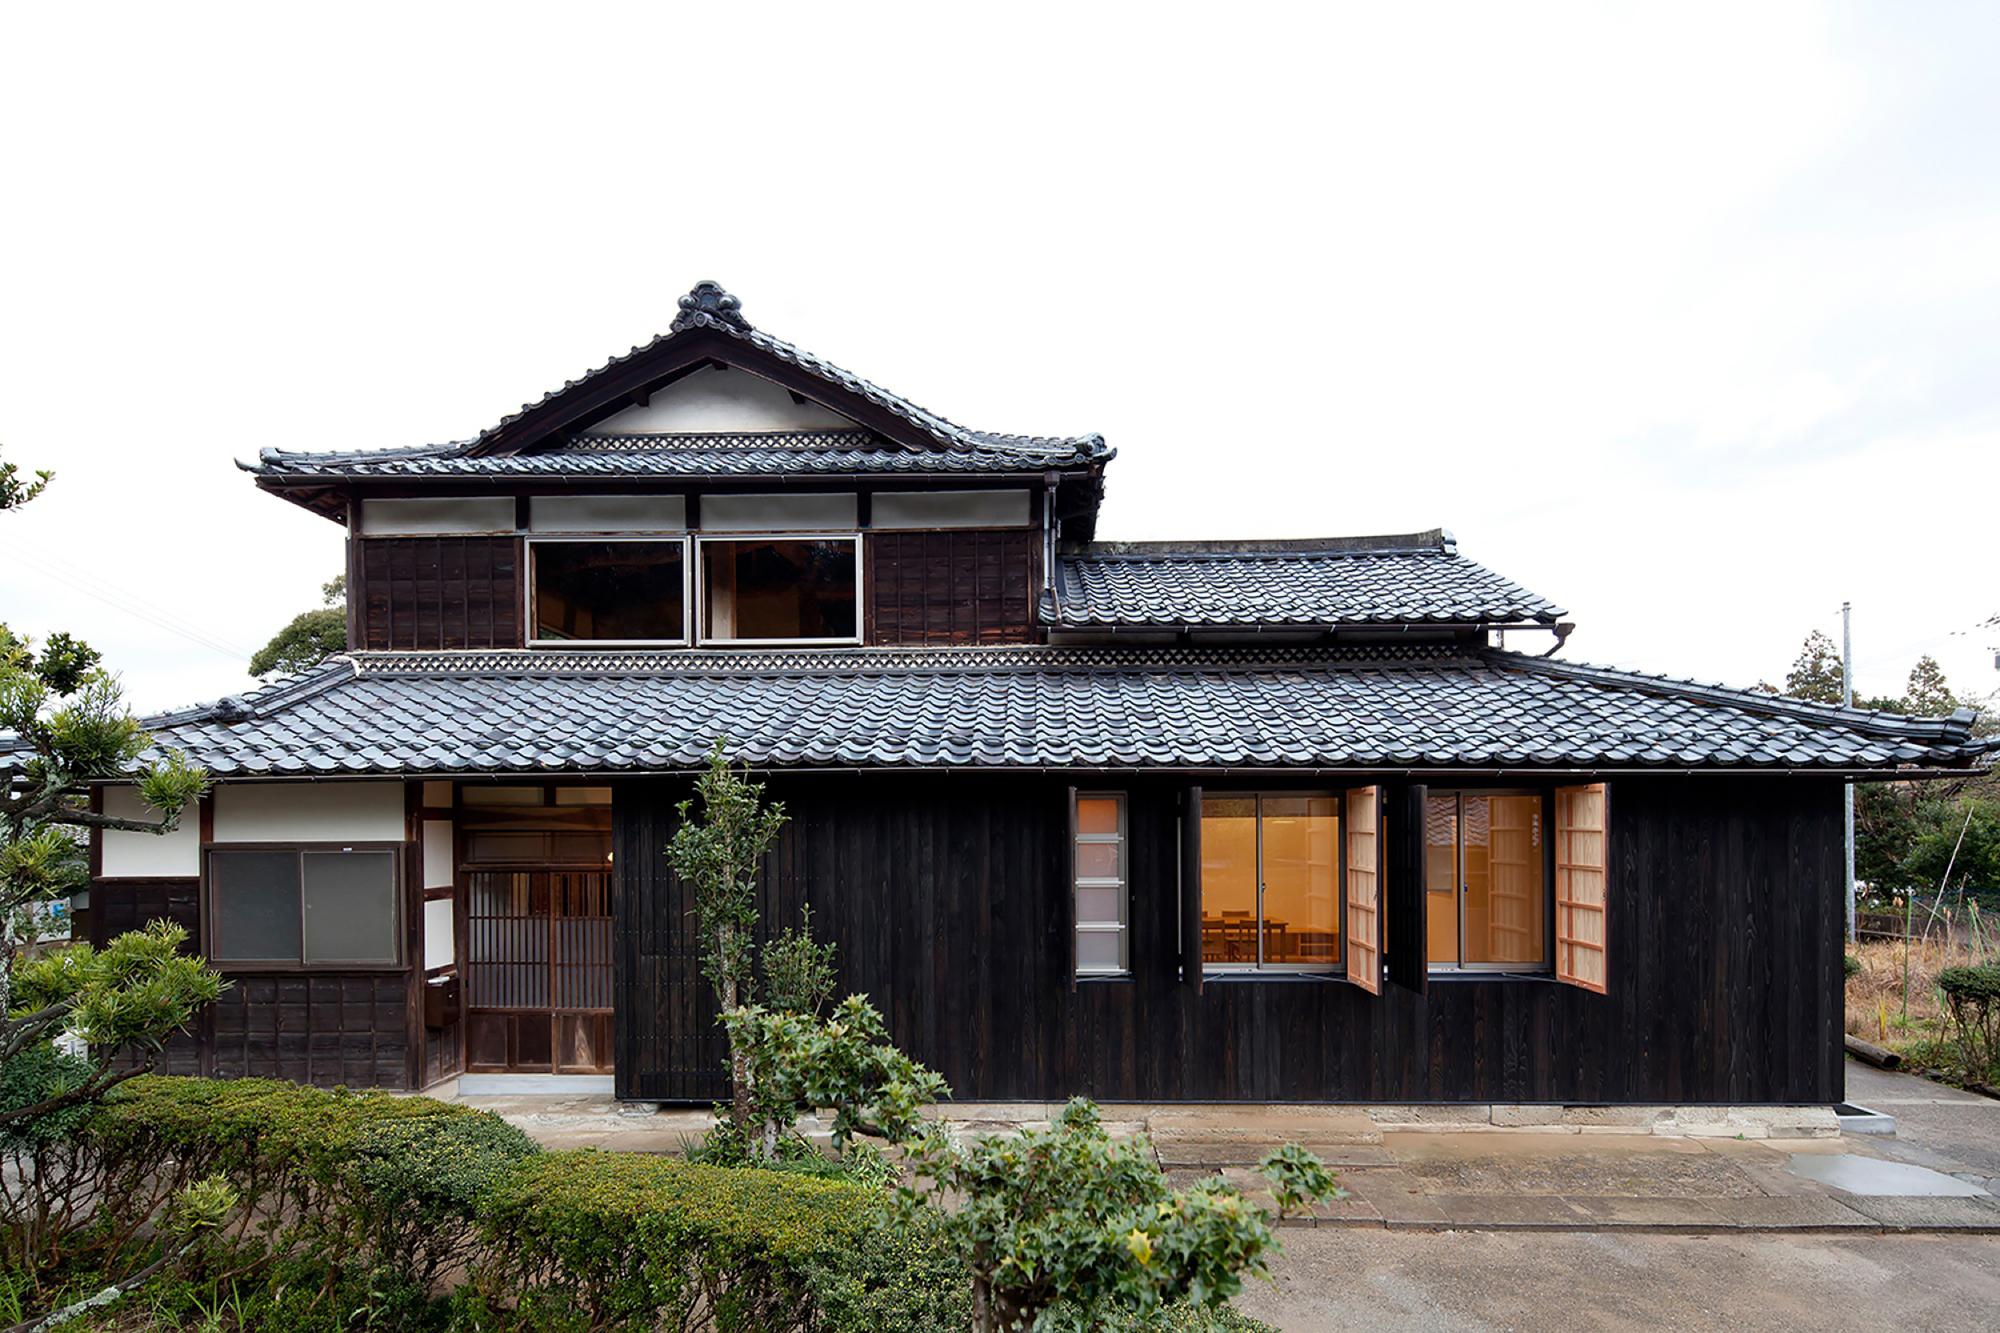 House Refurbishment in Kaga / Tailored design Lab